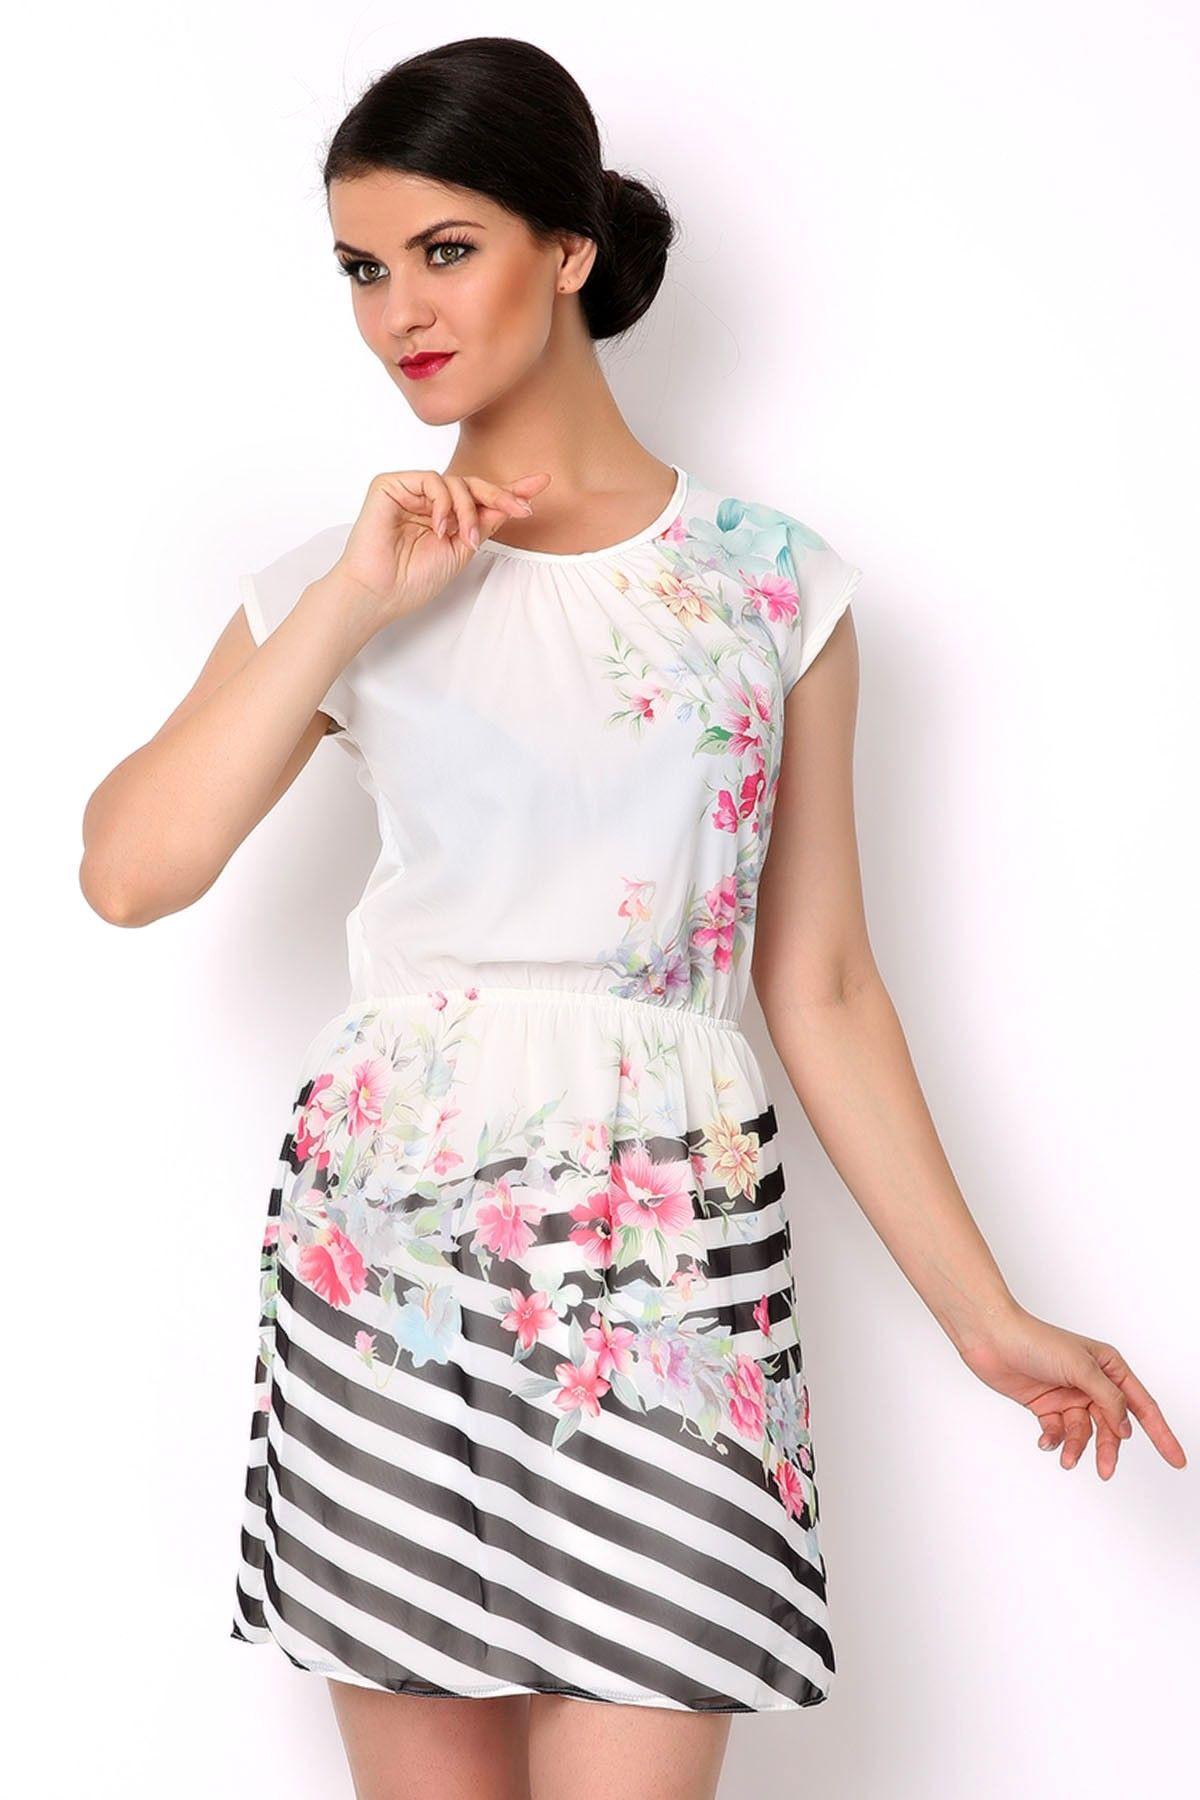 9b261ea204be9 KREM - ÇİÇEK BASKILI ELBİSE   Tozlu.com.tr'de!   Elbise Modelleri ...